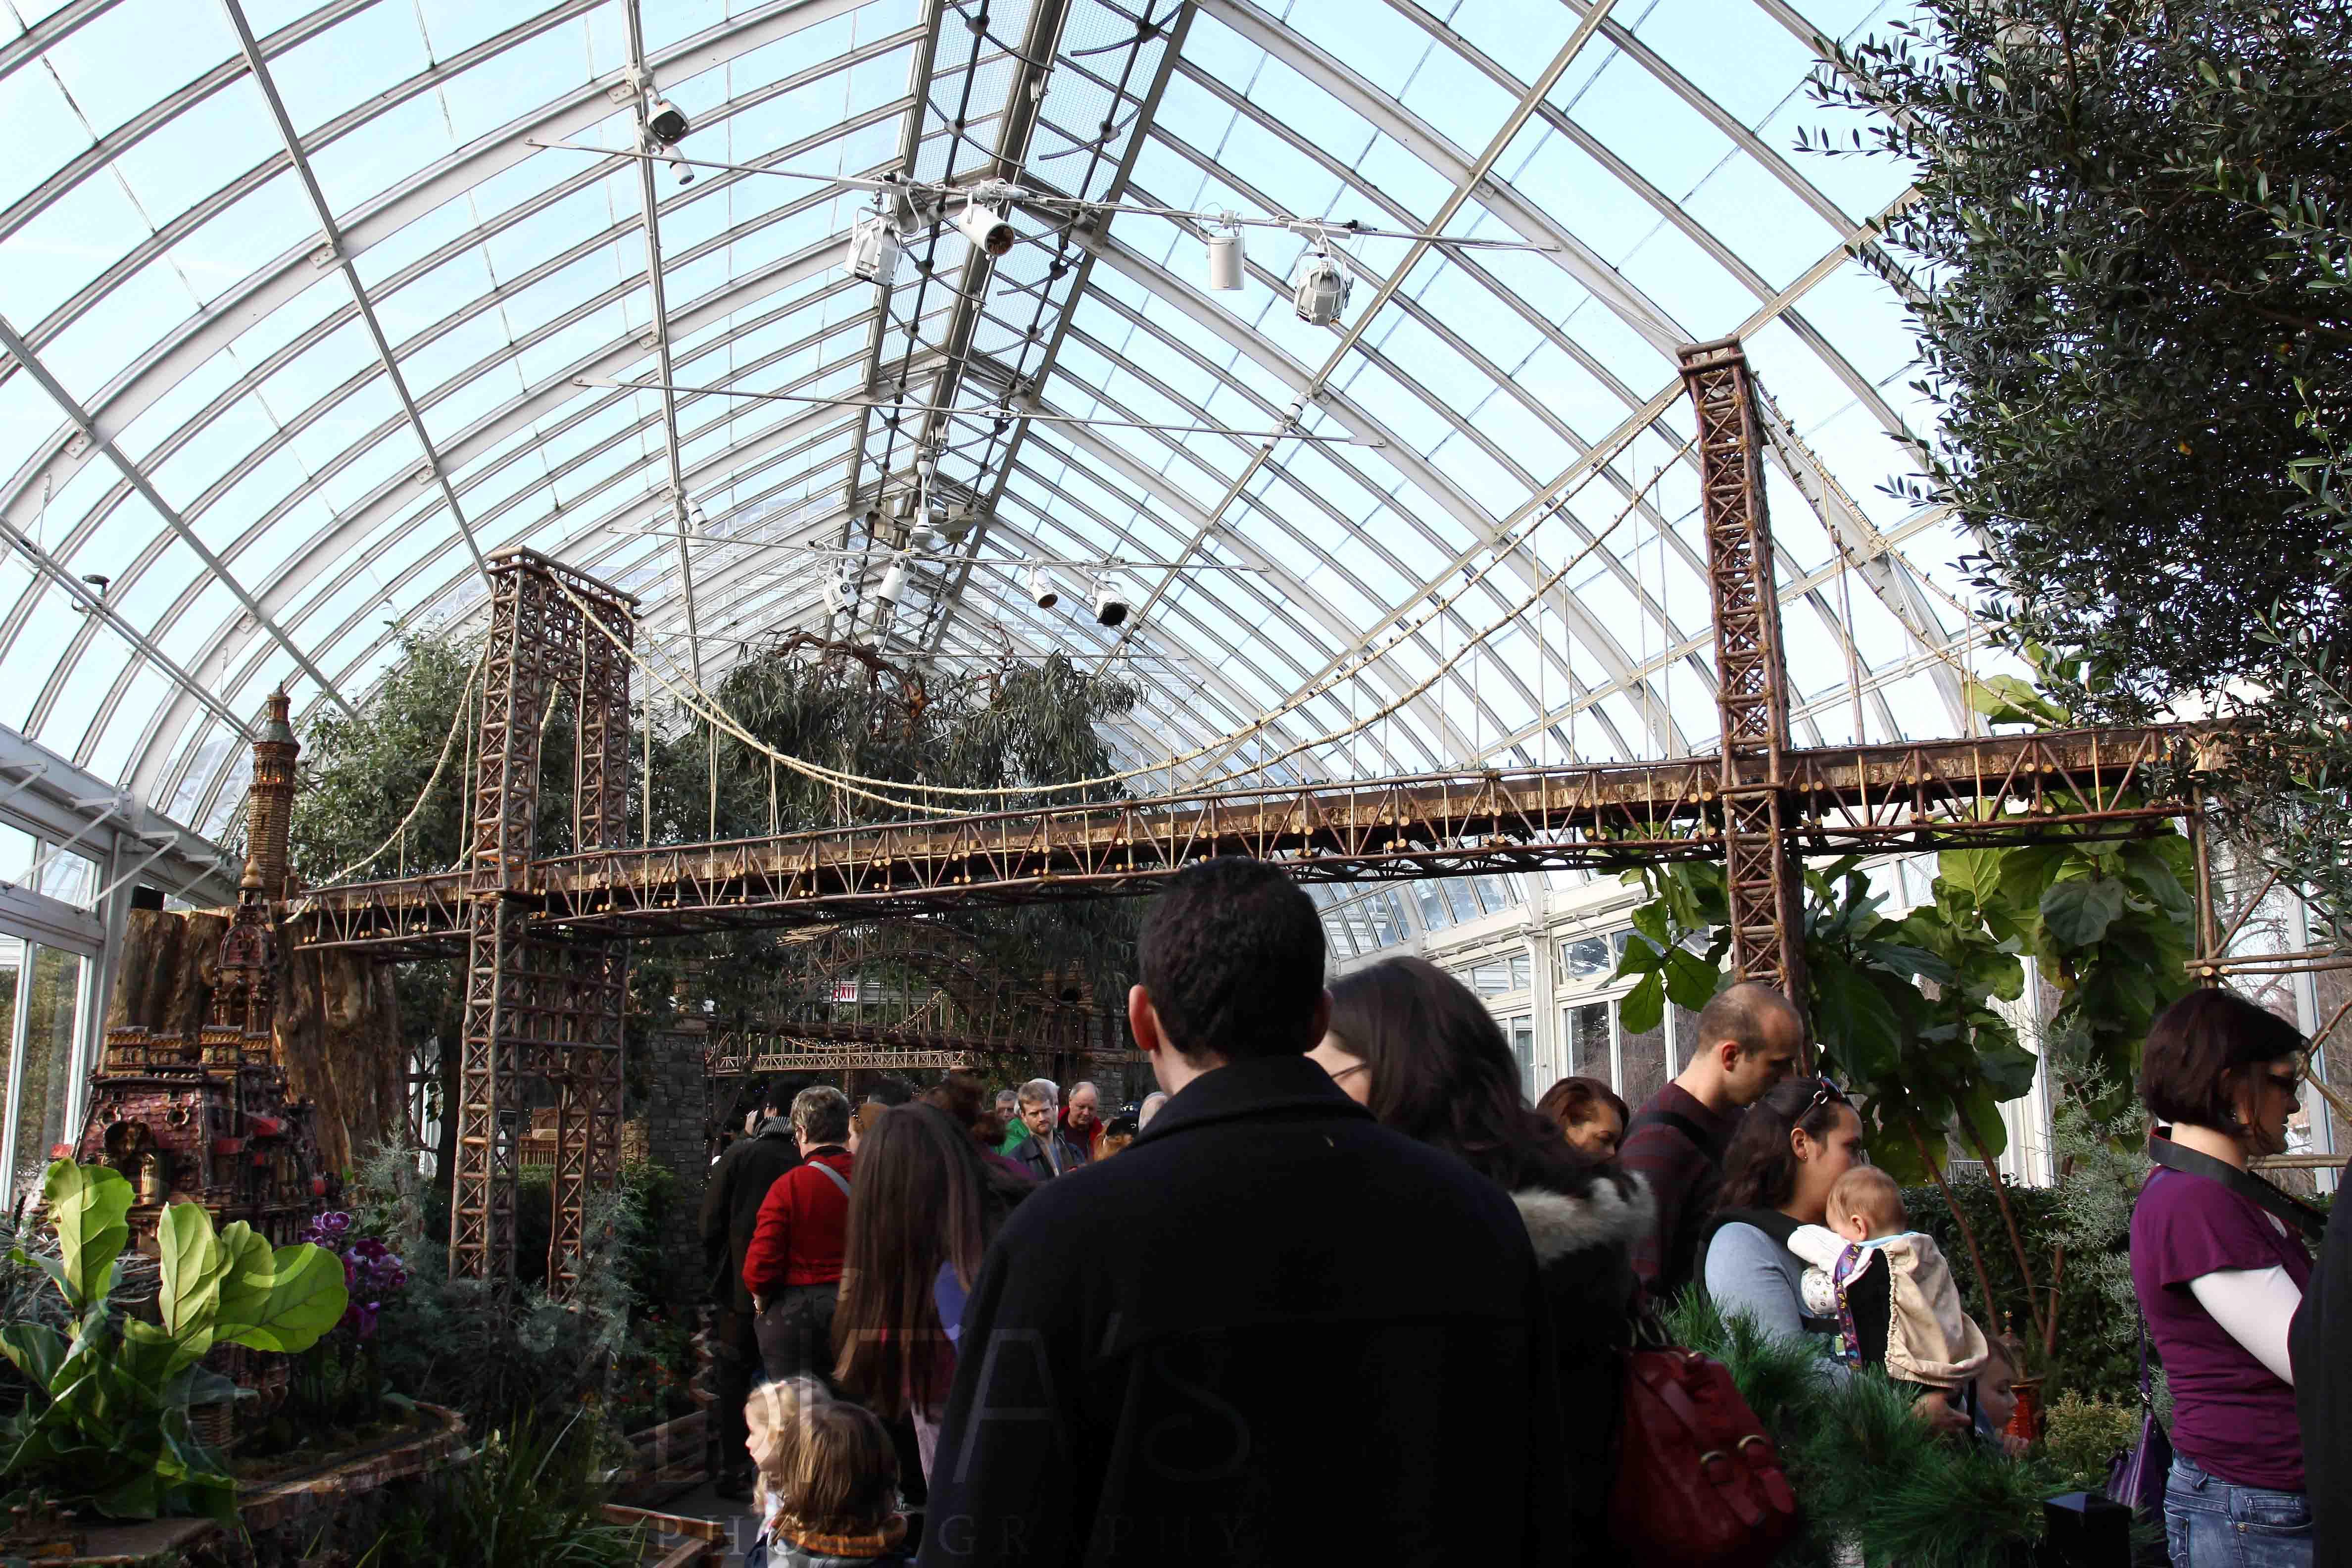 Botanical gardens trains and new york on pinterest - New york botanical garden promo code ...